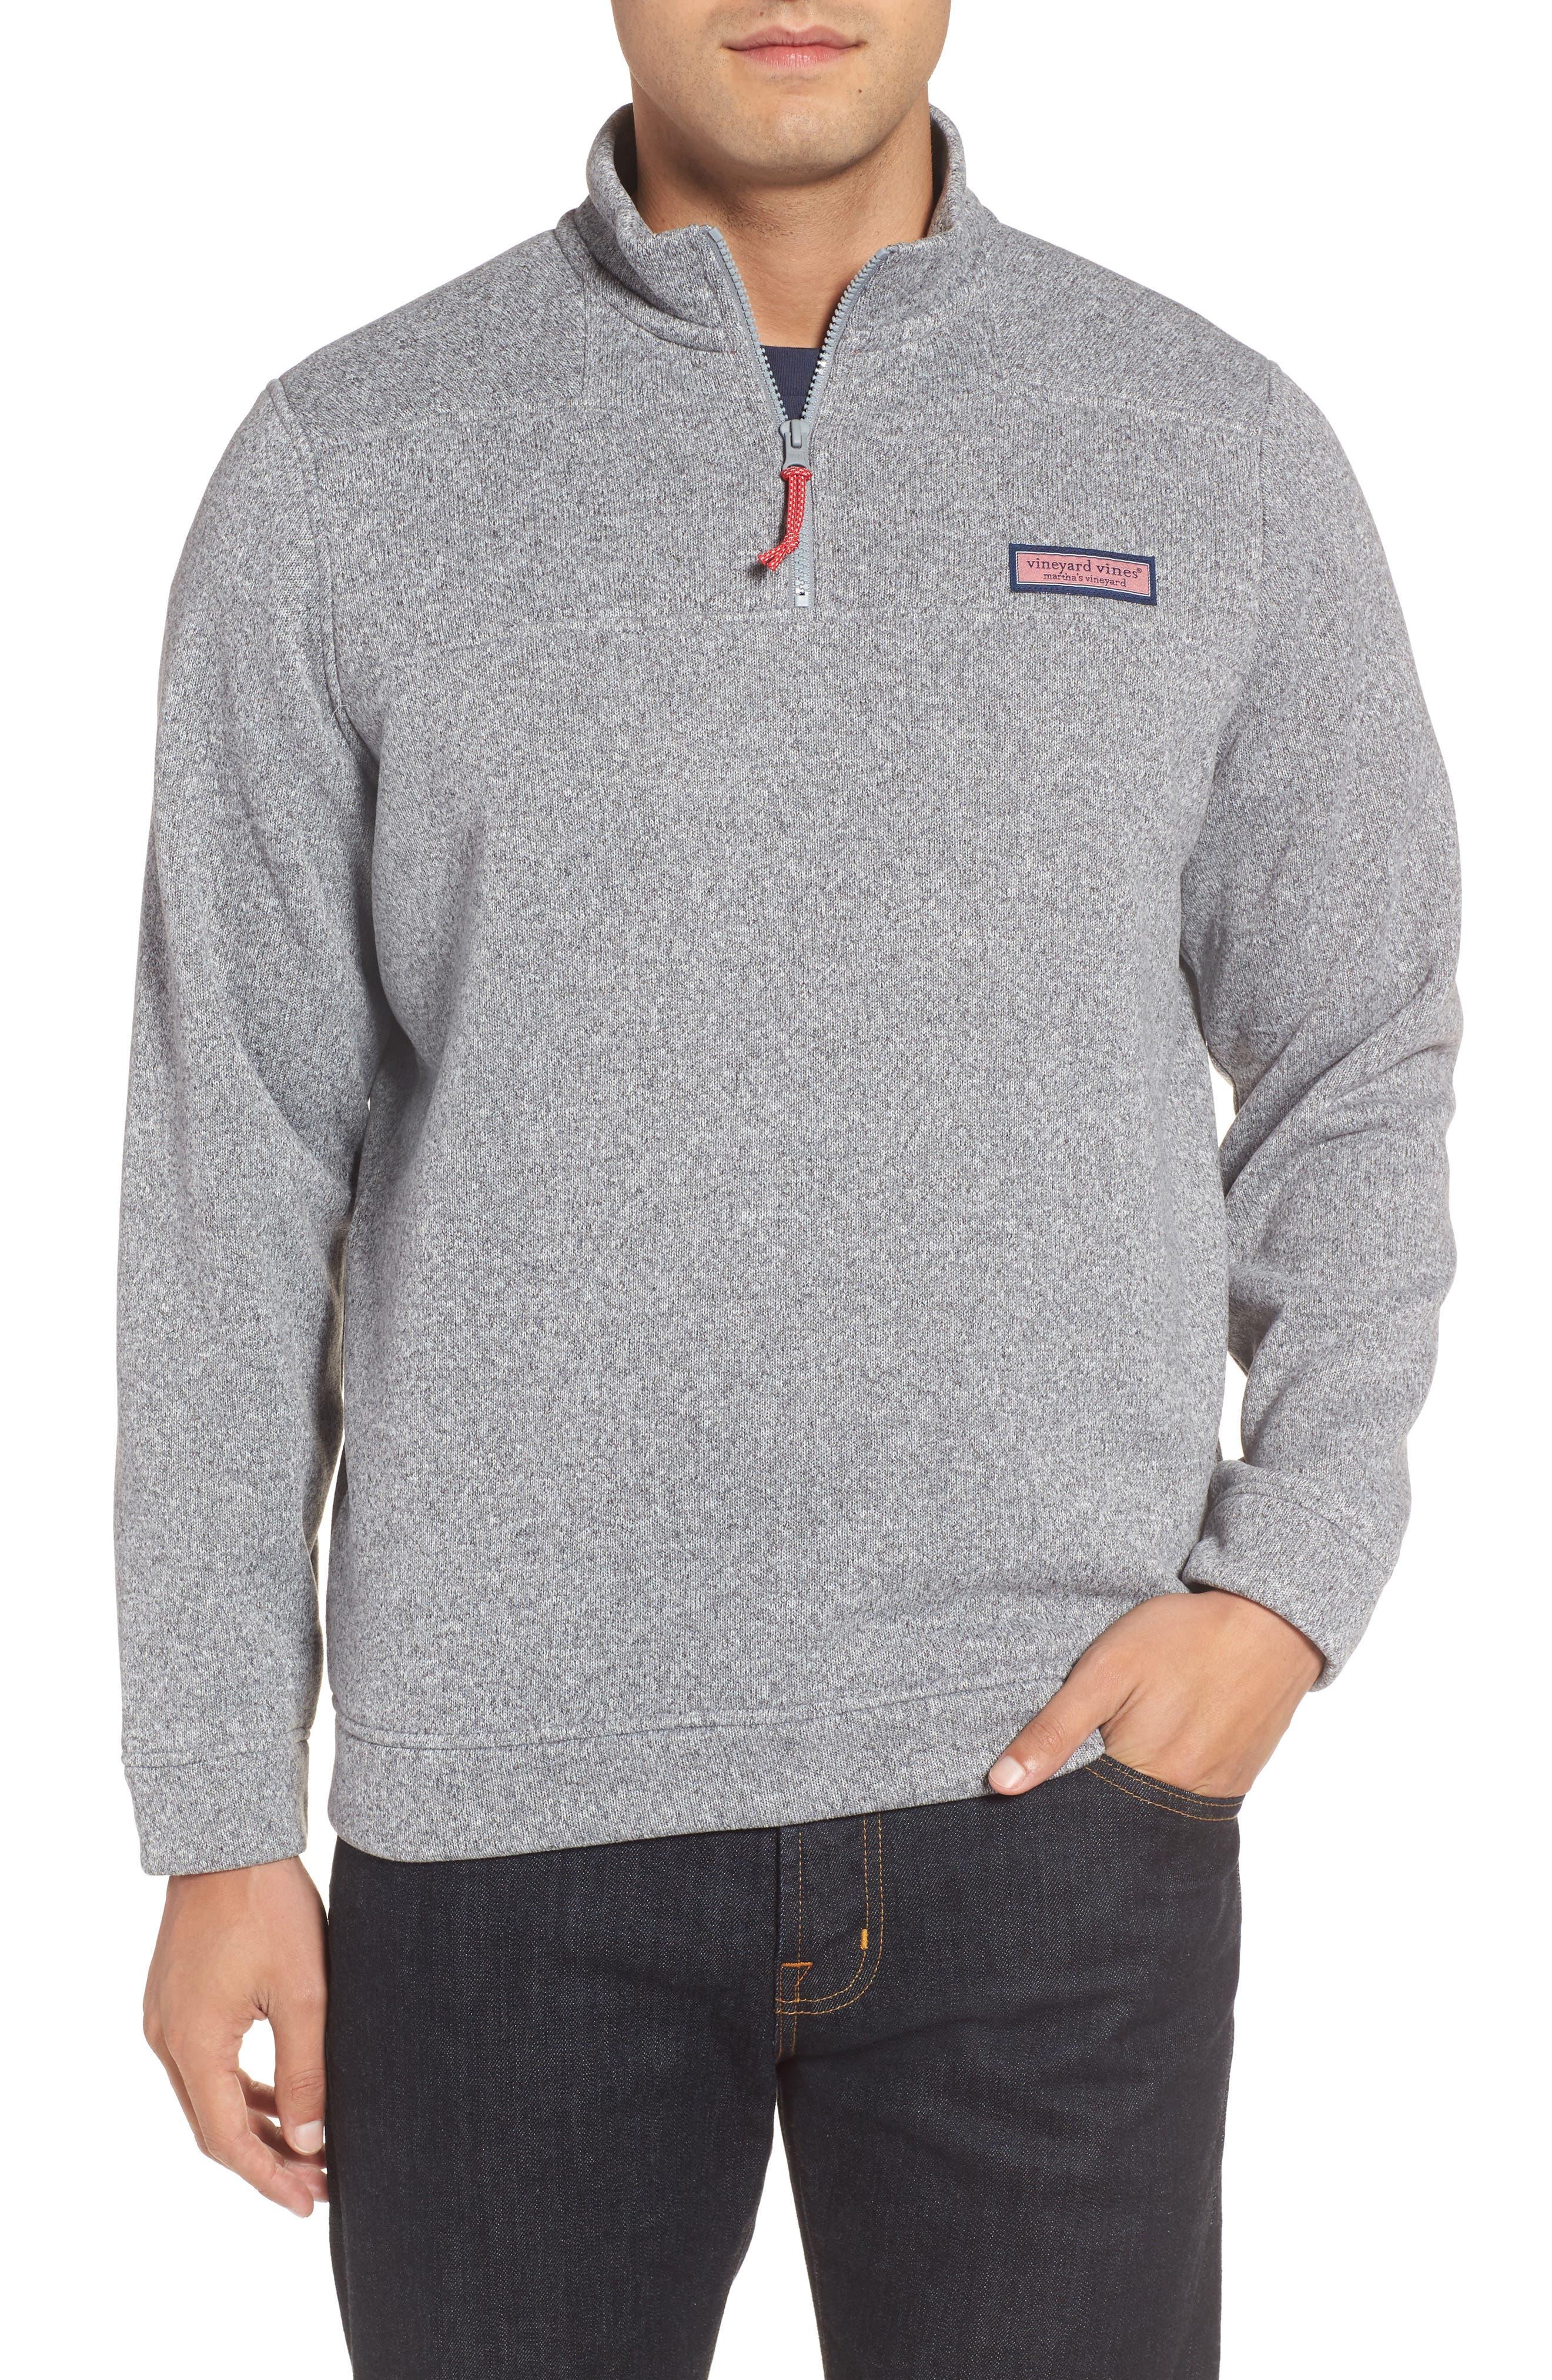 Alternate Image 1 Selected - vineyard vines Shep Sweater Fleece Quarter Zip Pullover